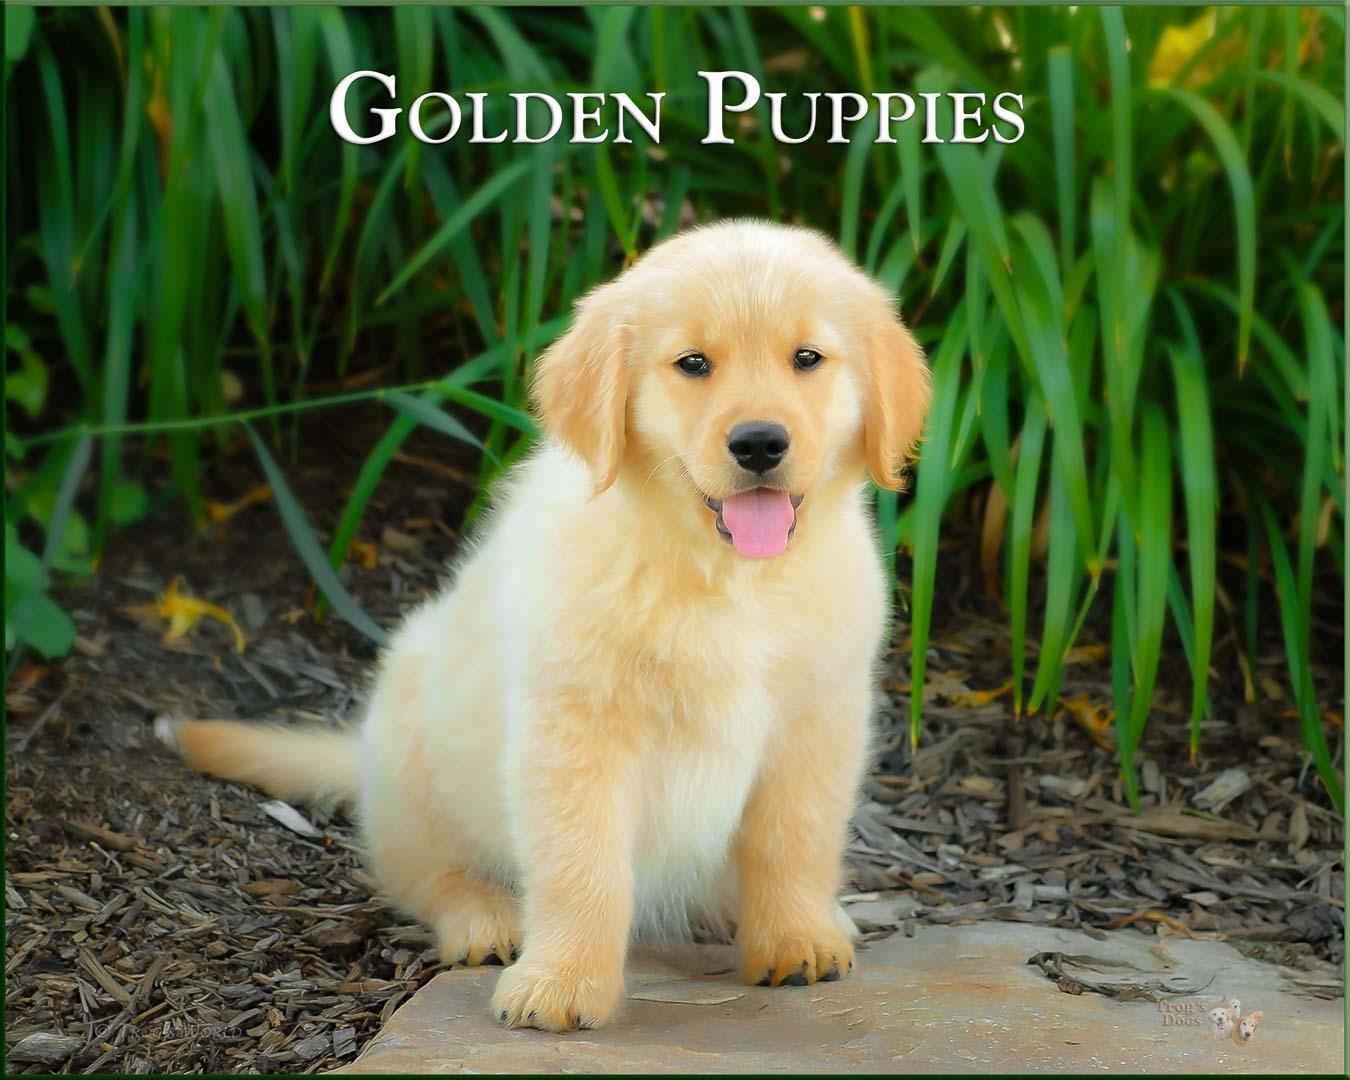 Golden Retriever Puppy sitting on a rock